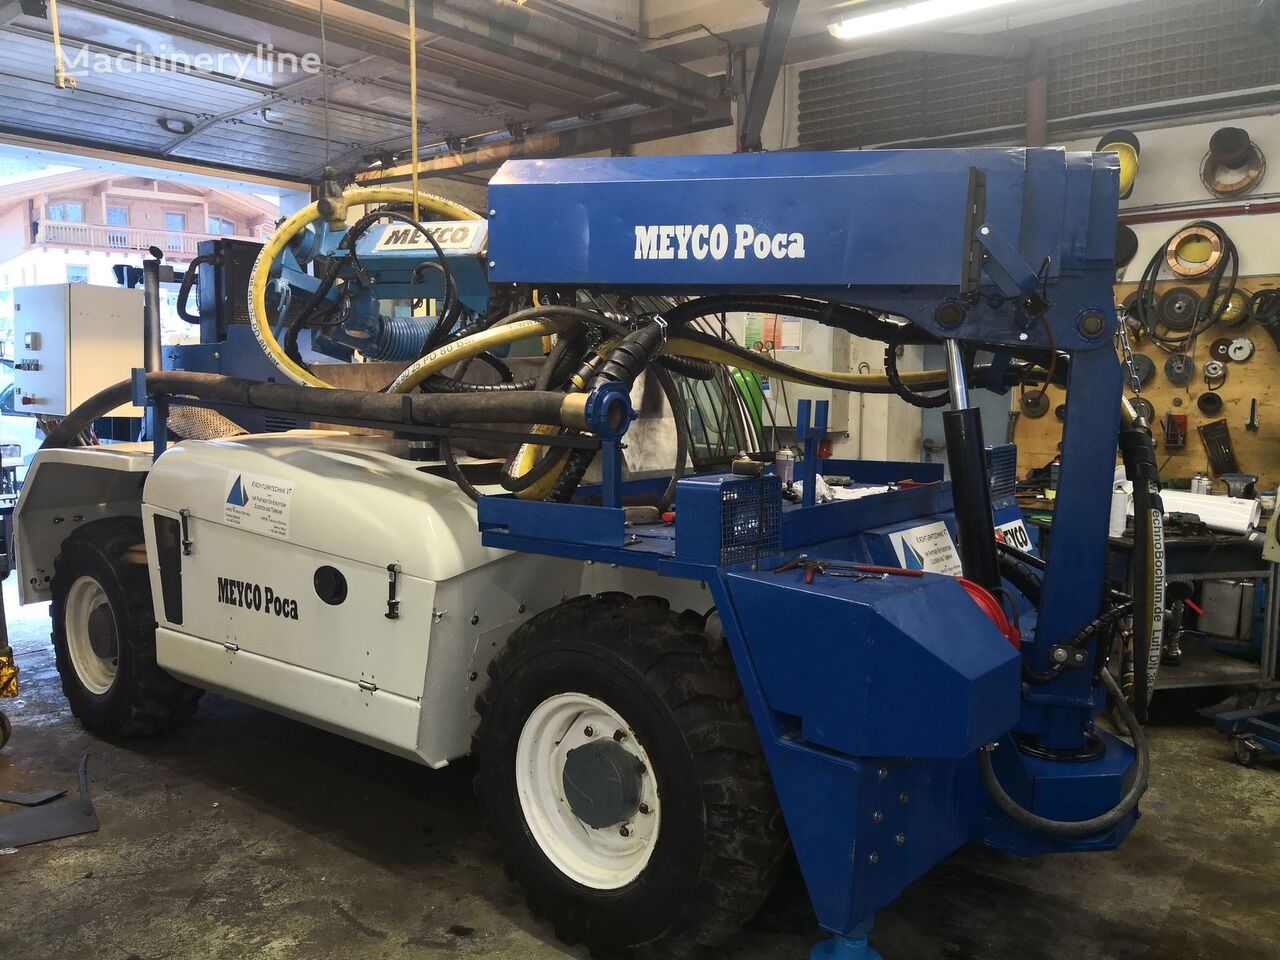 alt echipament subteran MEYCO Poca